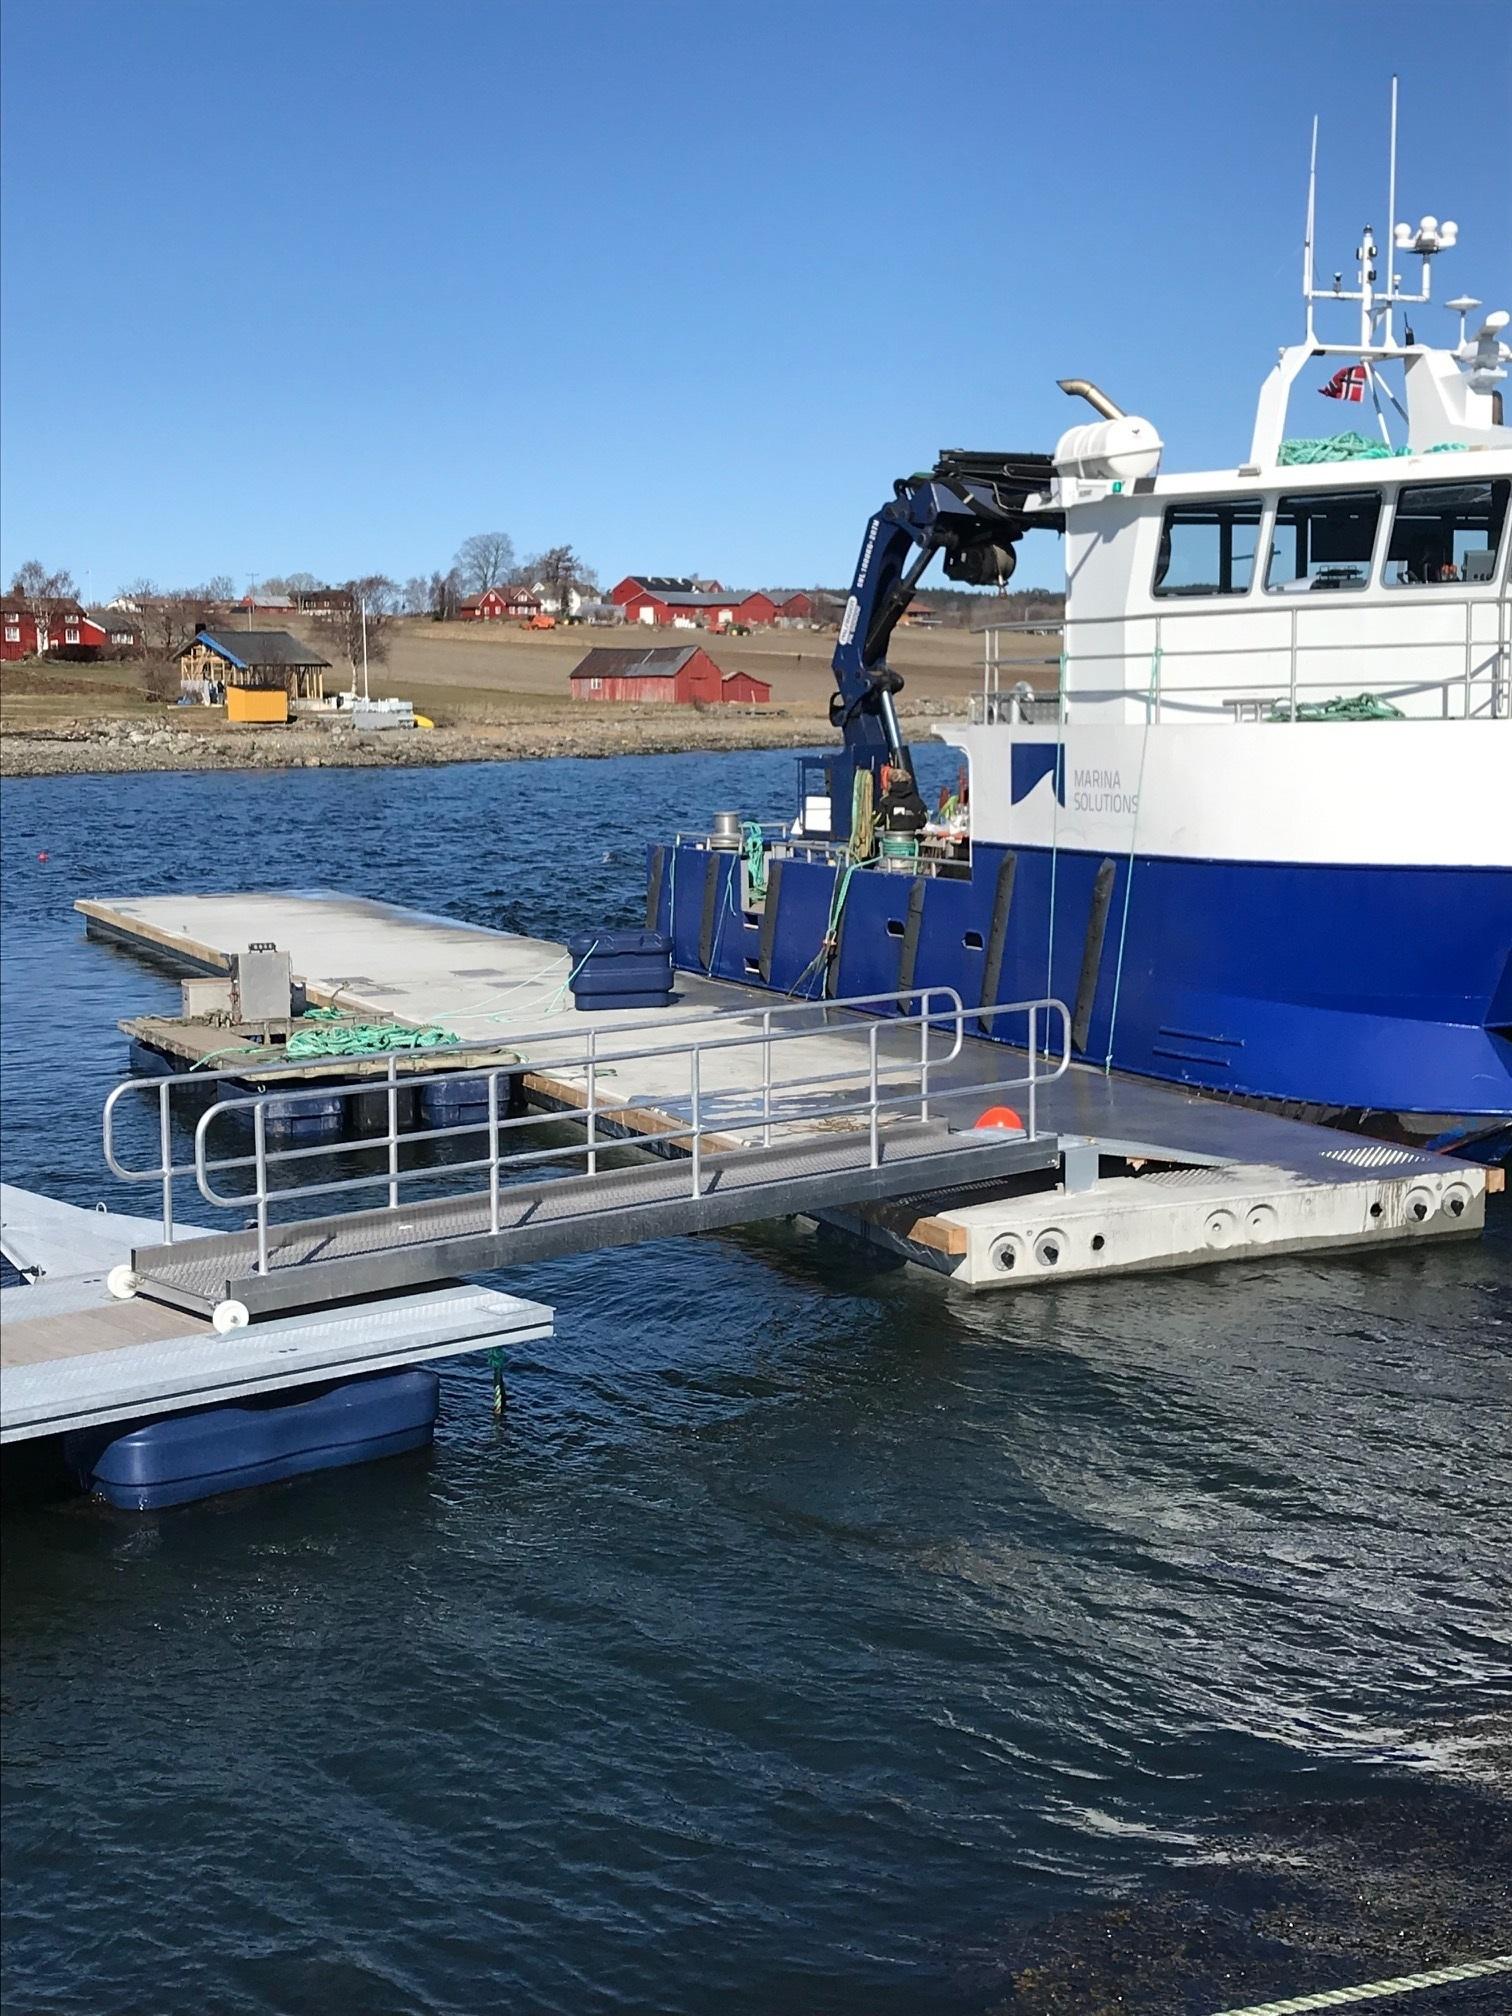 https://www.marinasolutions.no/uploads/Mostadkaia-Frosta-Marina-Solutions-bølgedemper-Marina-Ocean-Aursand.jpg